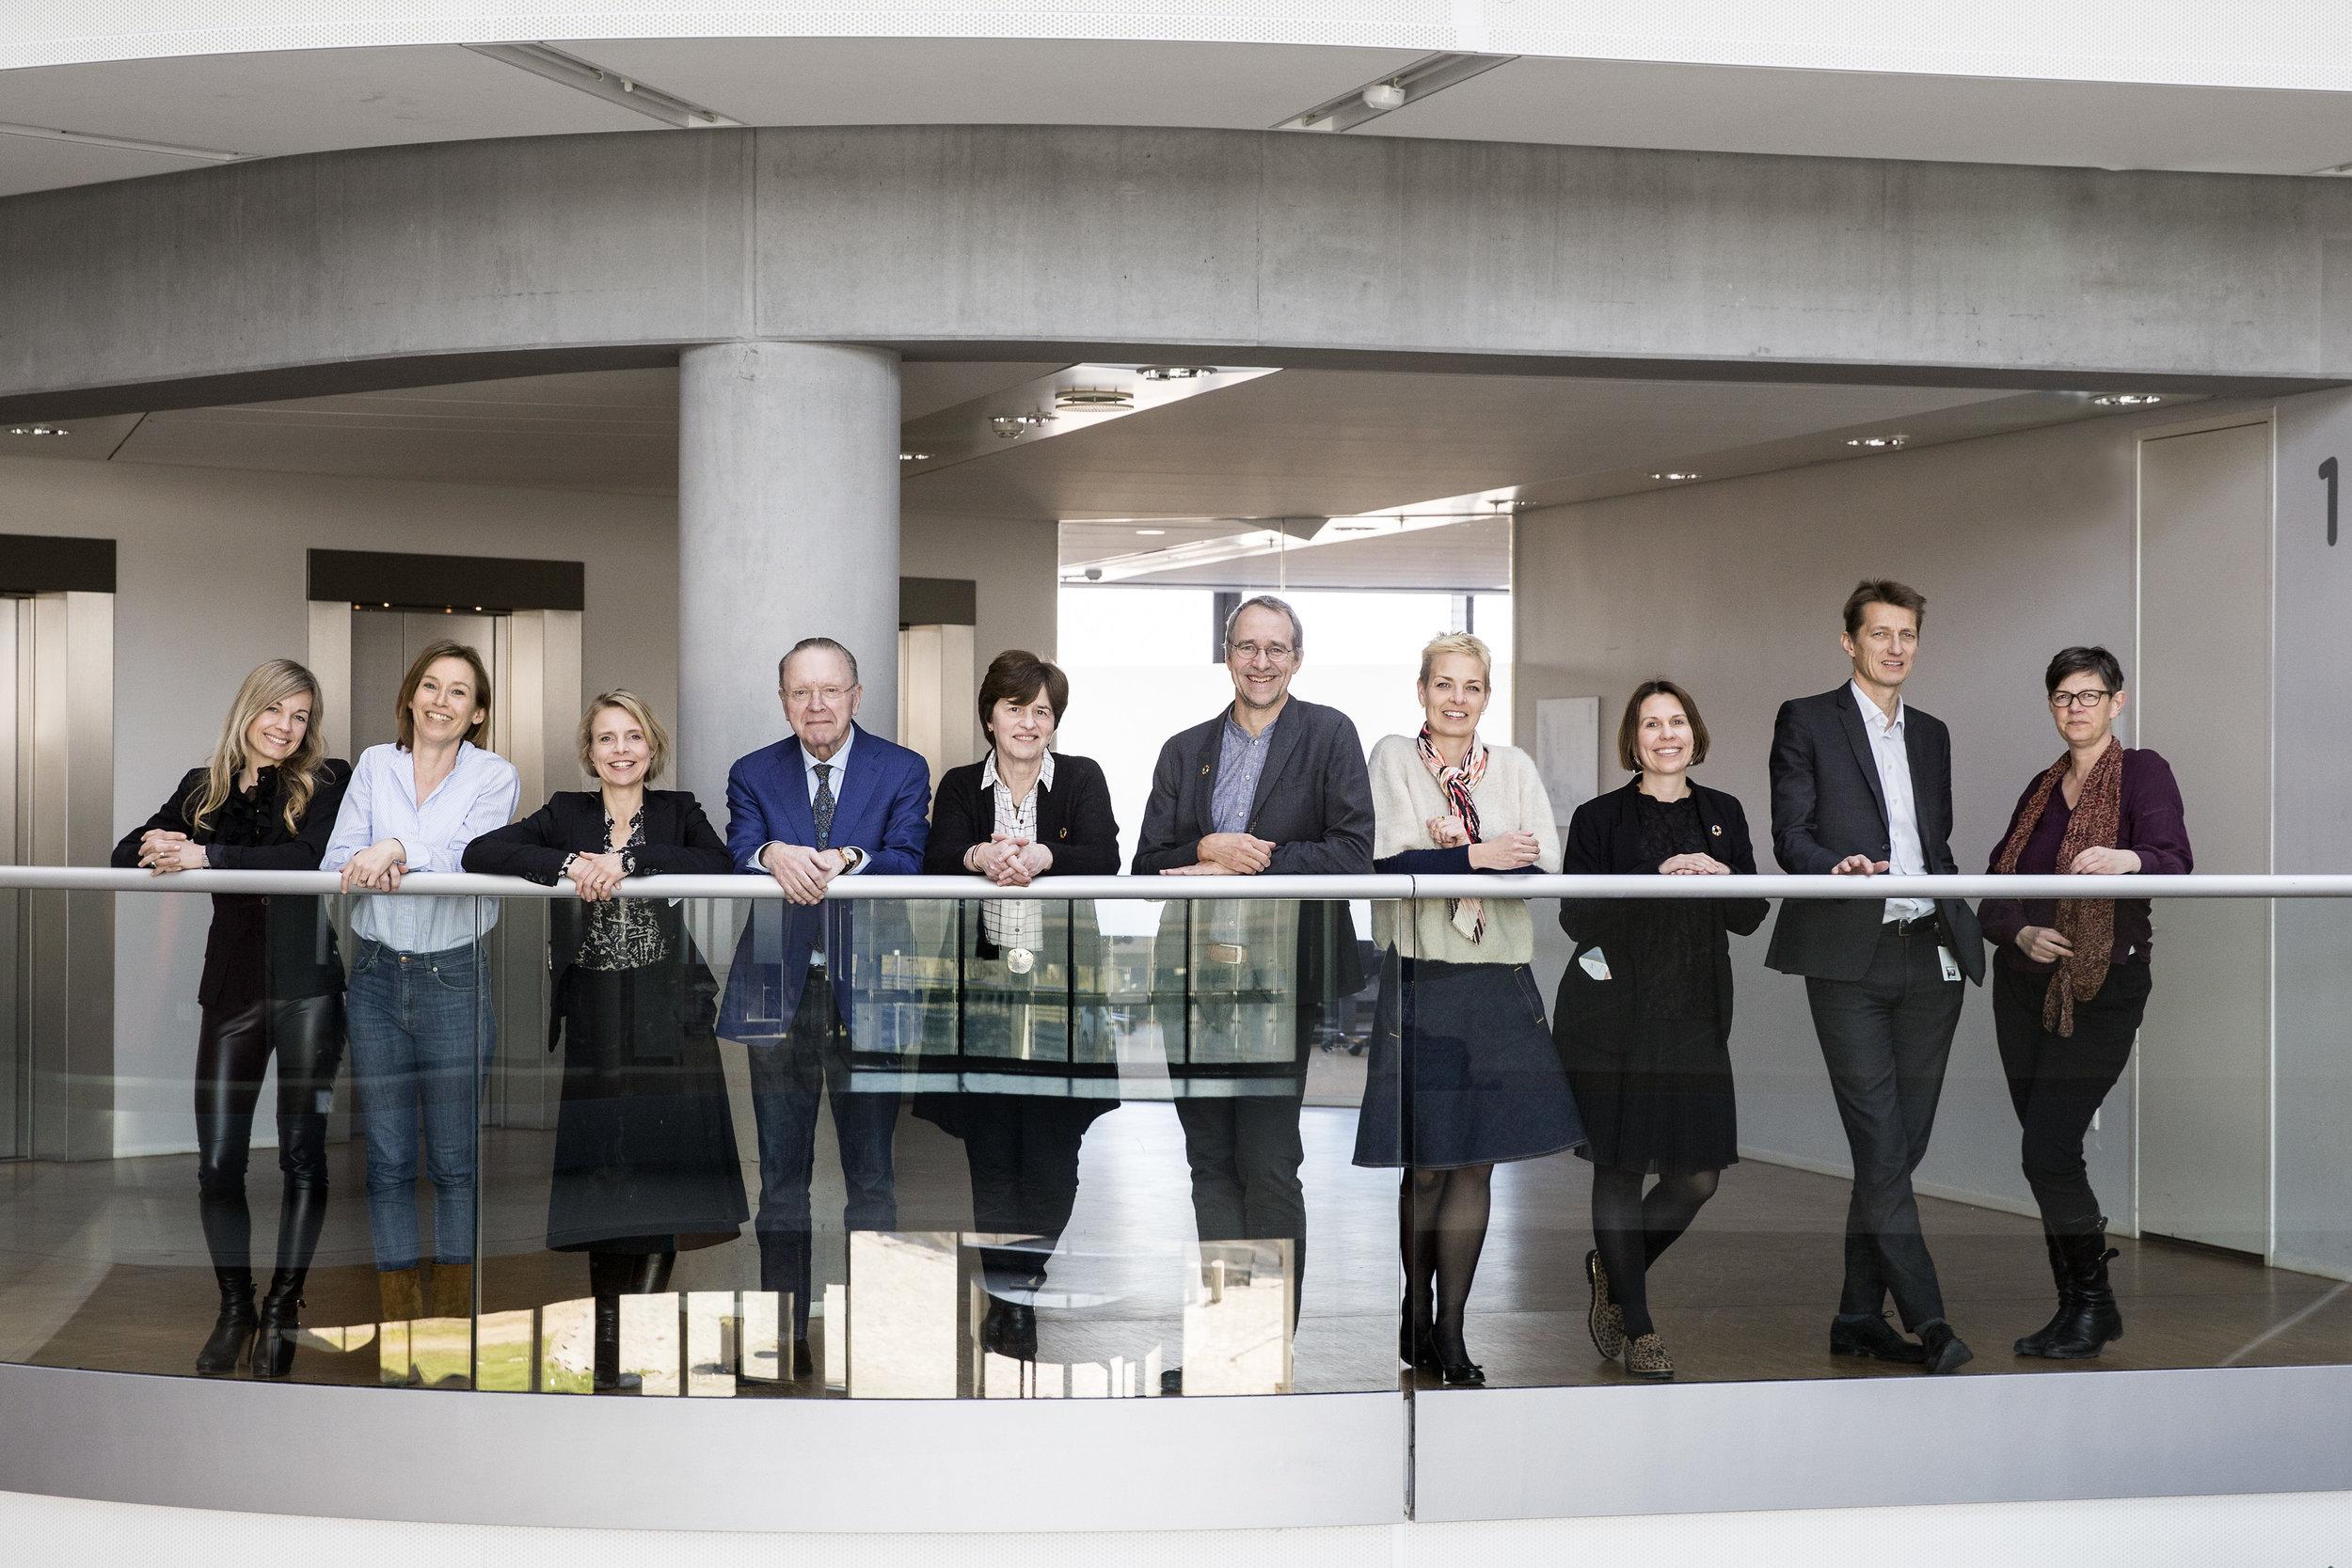 Bæredygtig udvikling - Mød ØICCs Advisory Board